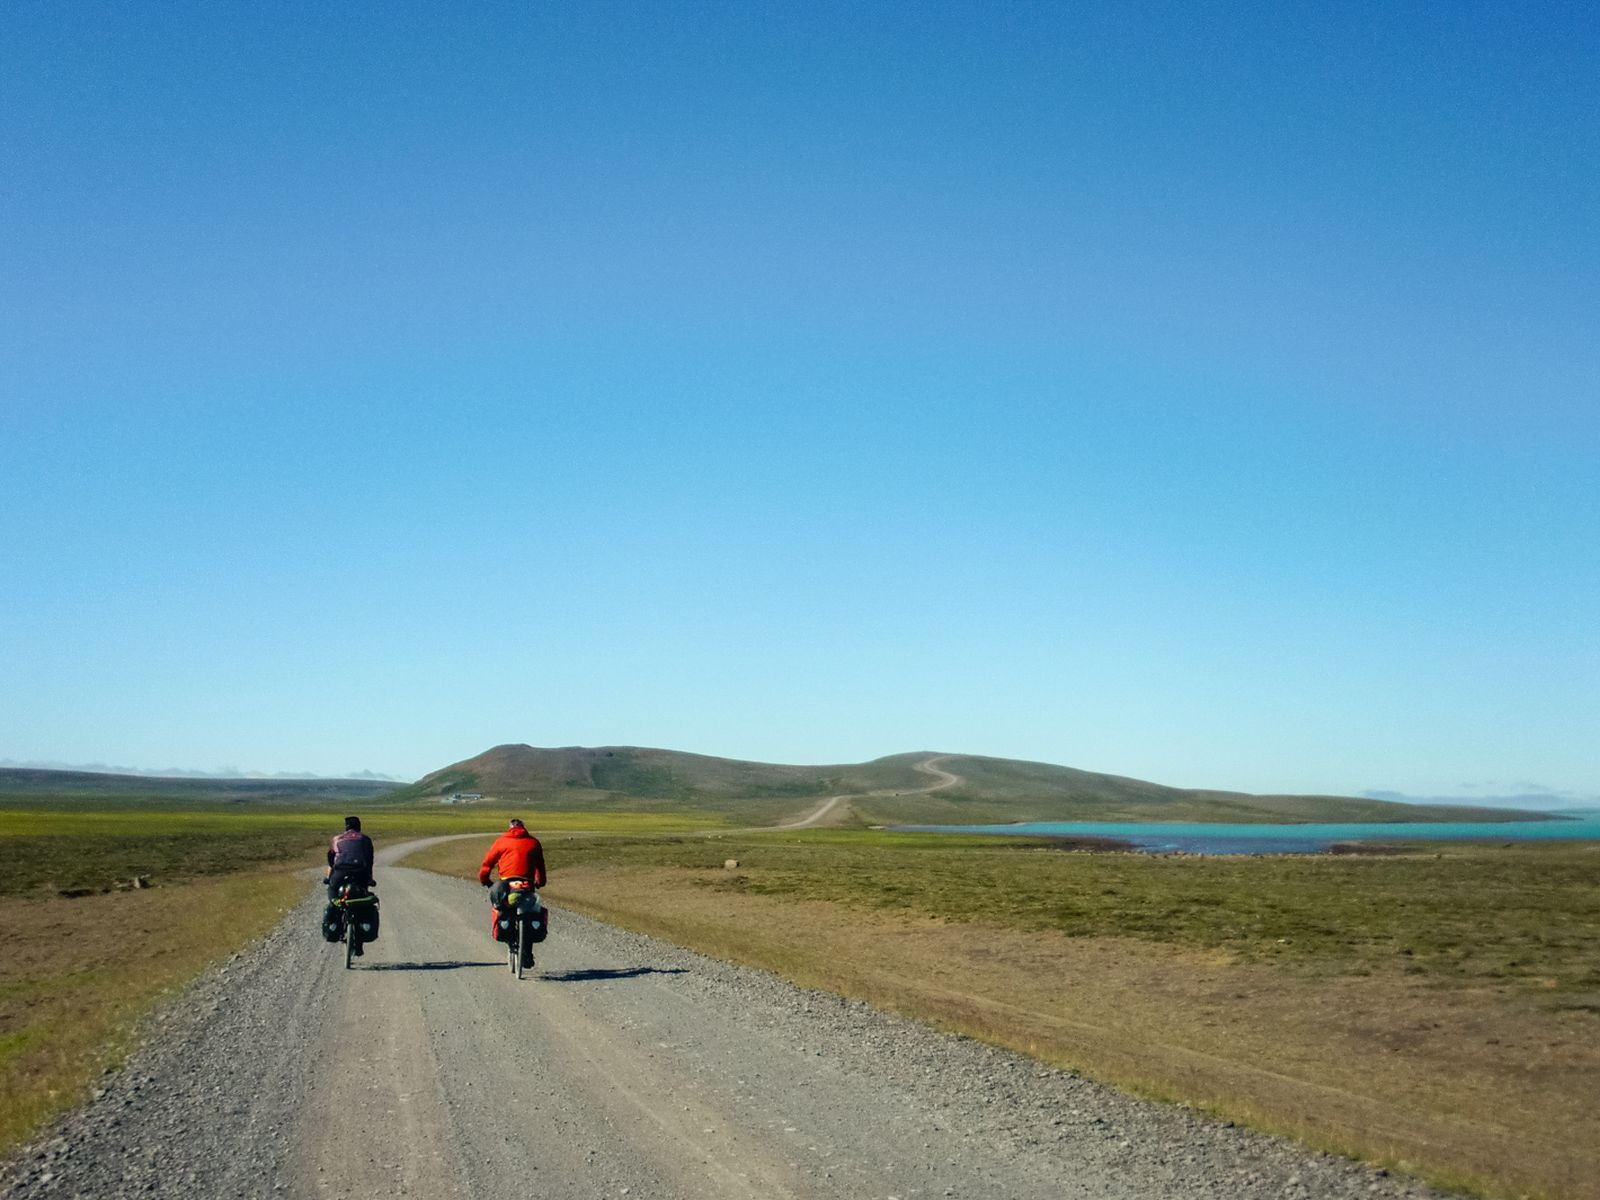 islanda_bicicletta-14